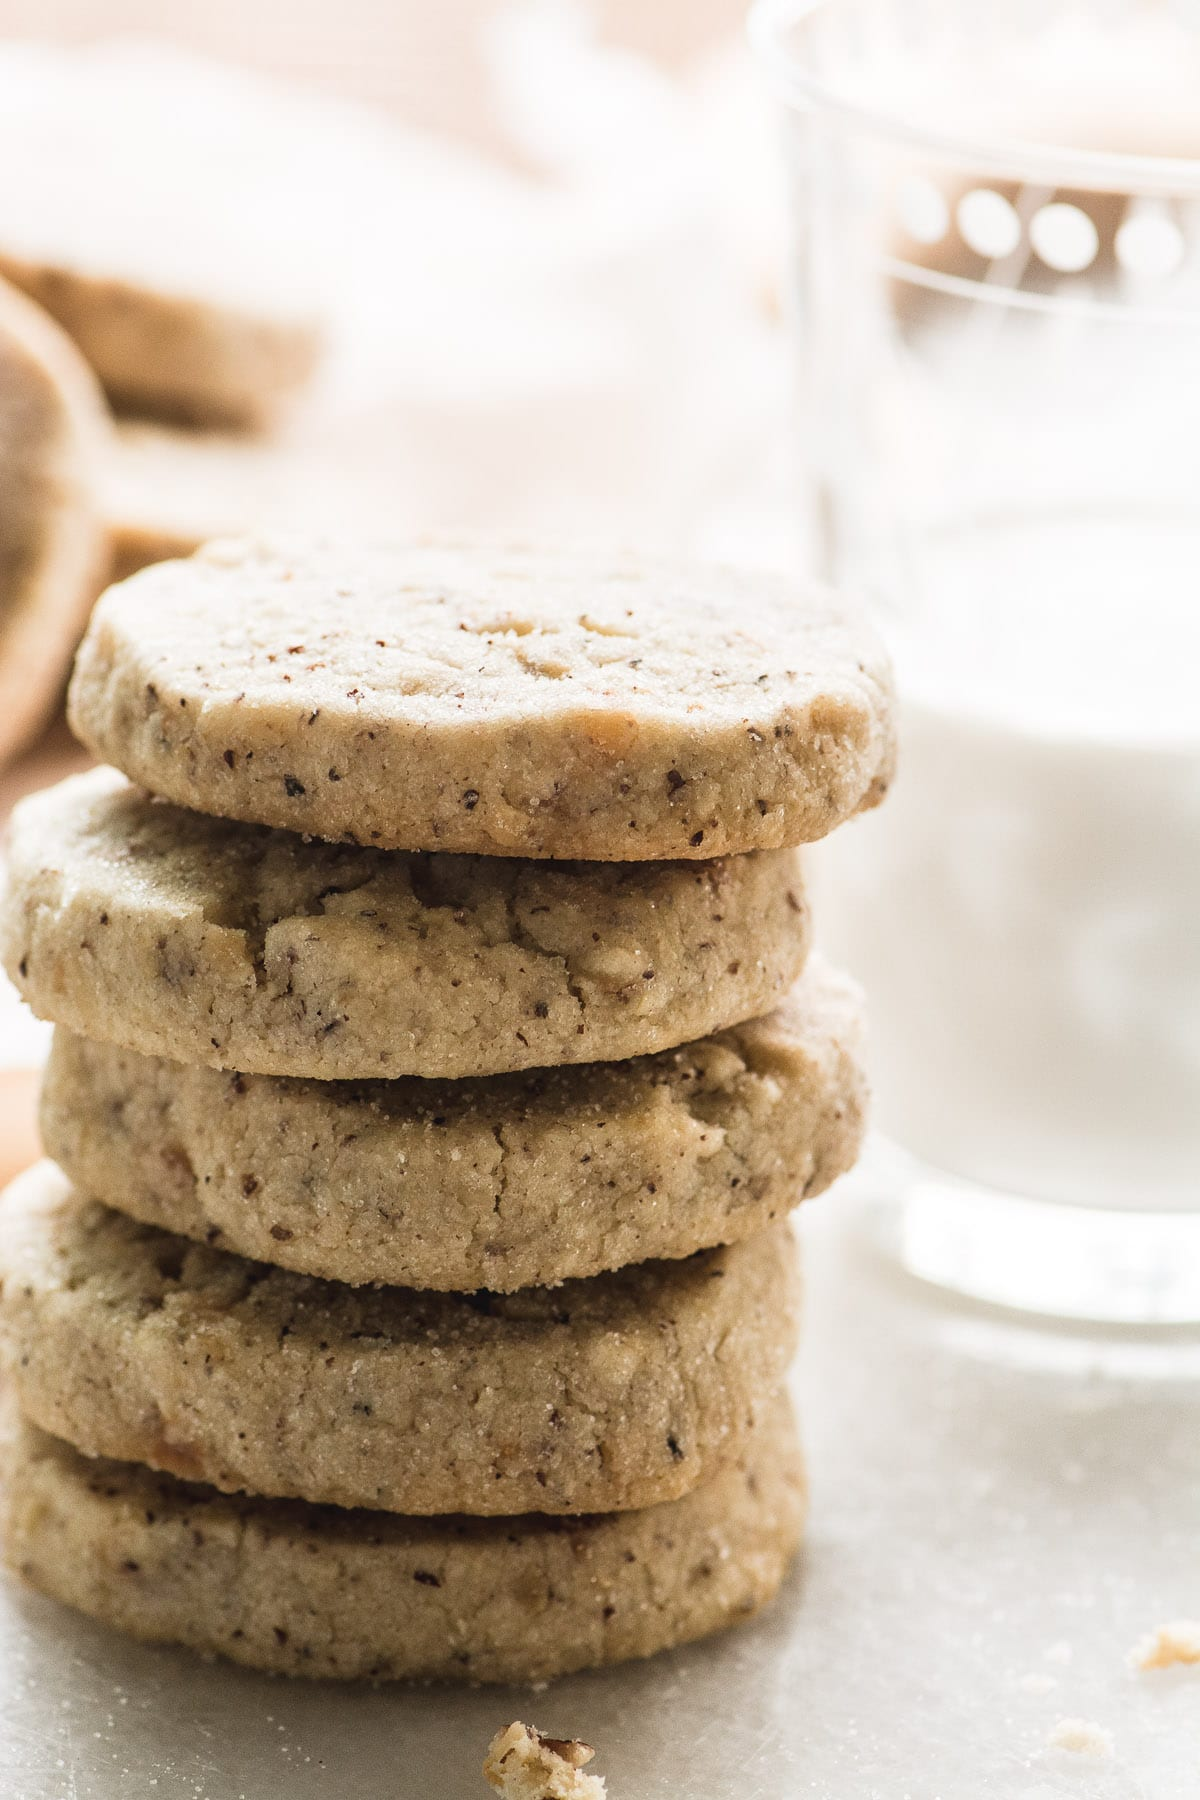 A stack of hazelnut sandies cookies with milk